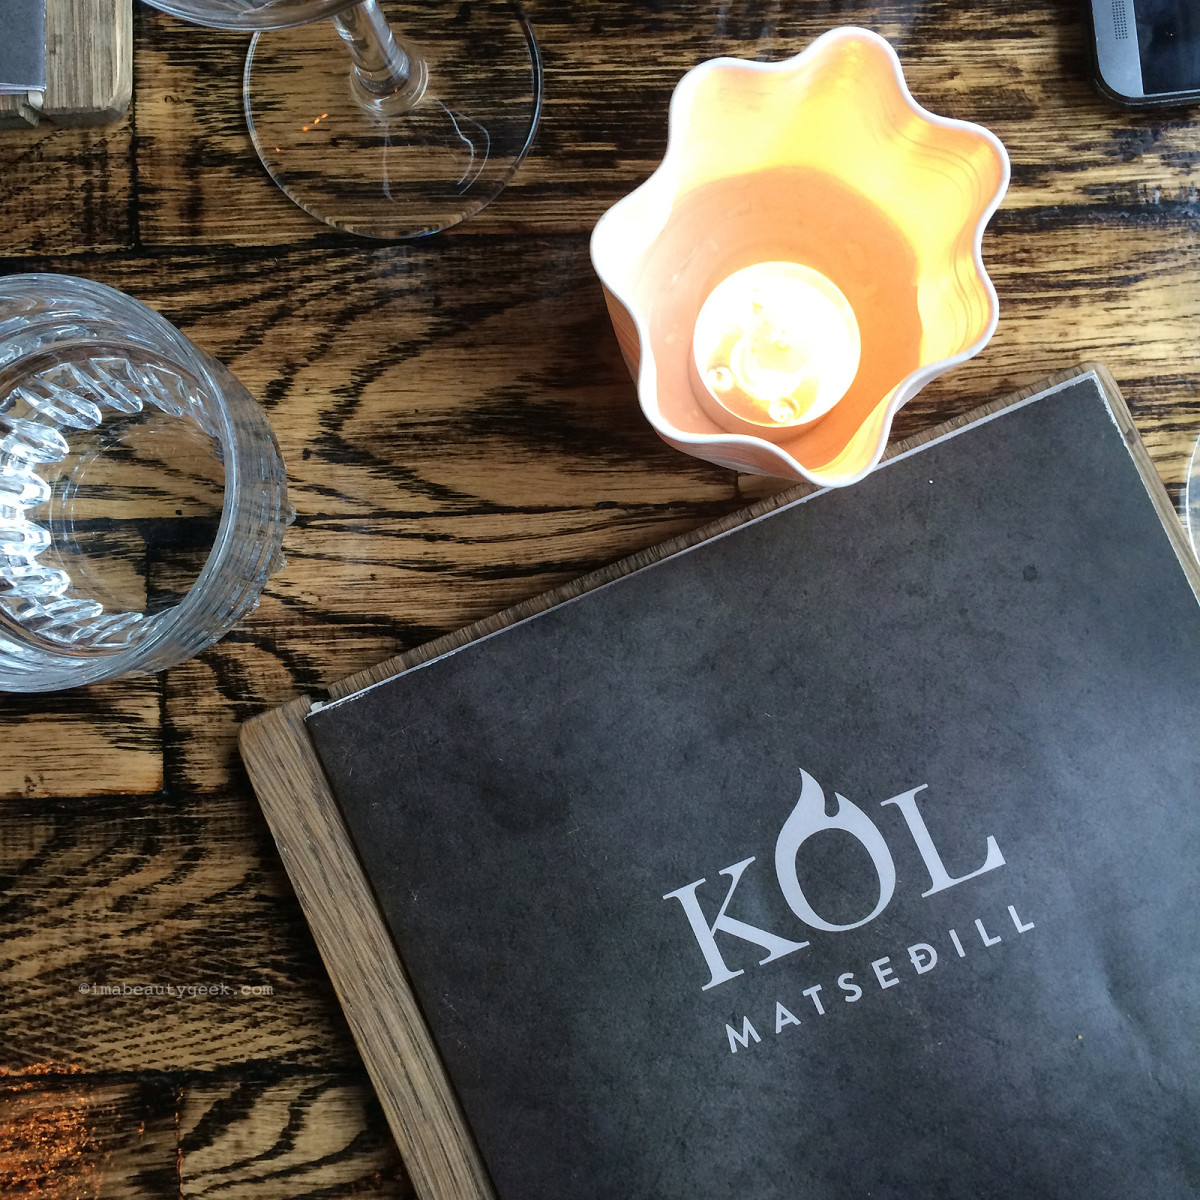 Kol Restaurant in Reykjavik